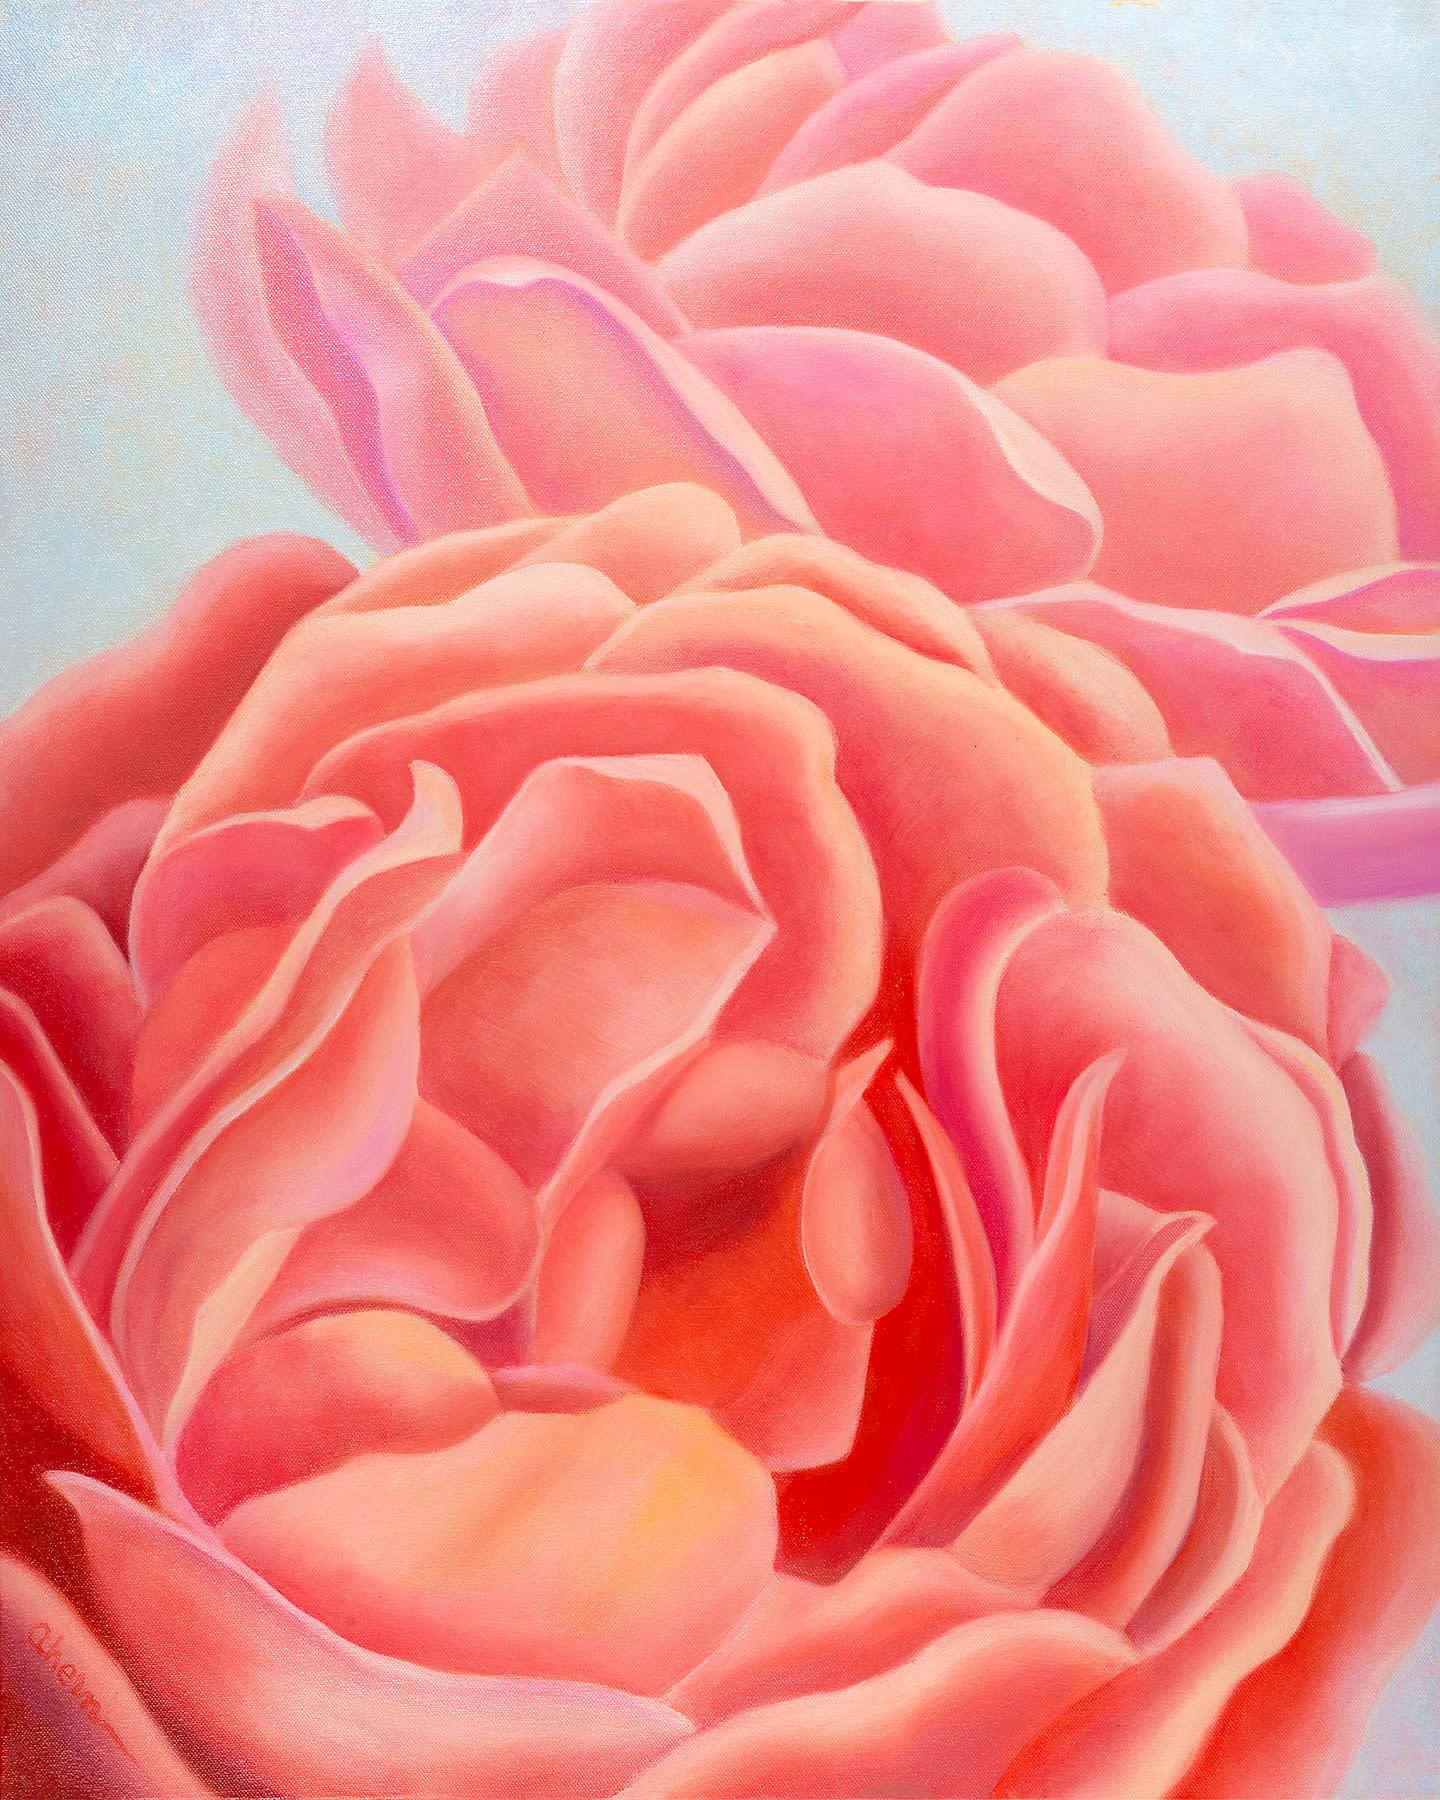 180330 ahern we are sisters coral roses 20x72 fk2cop